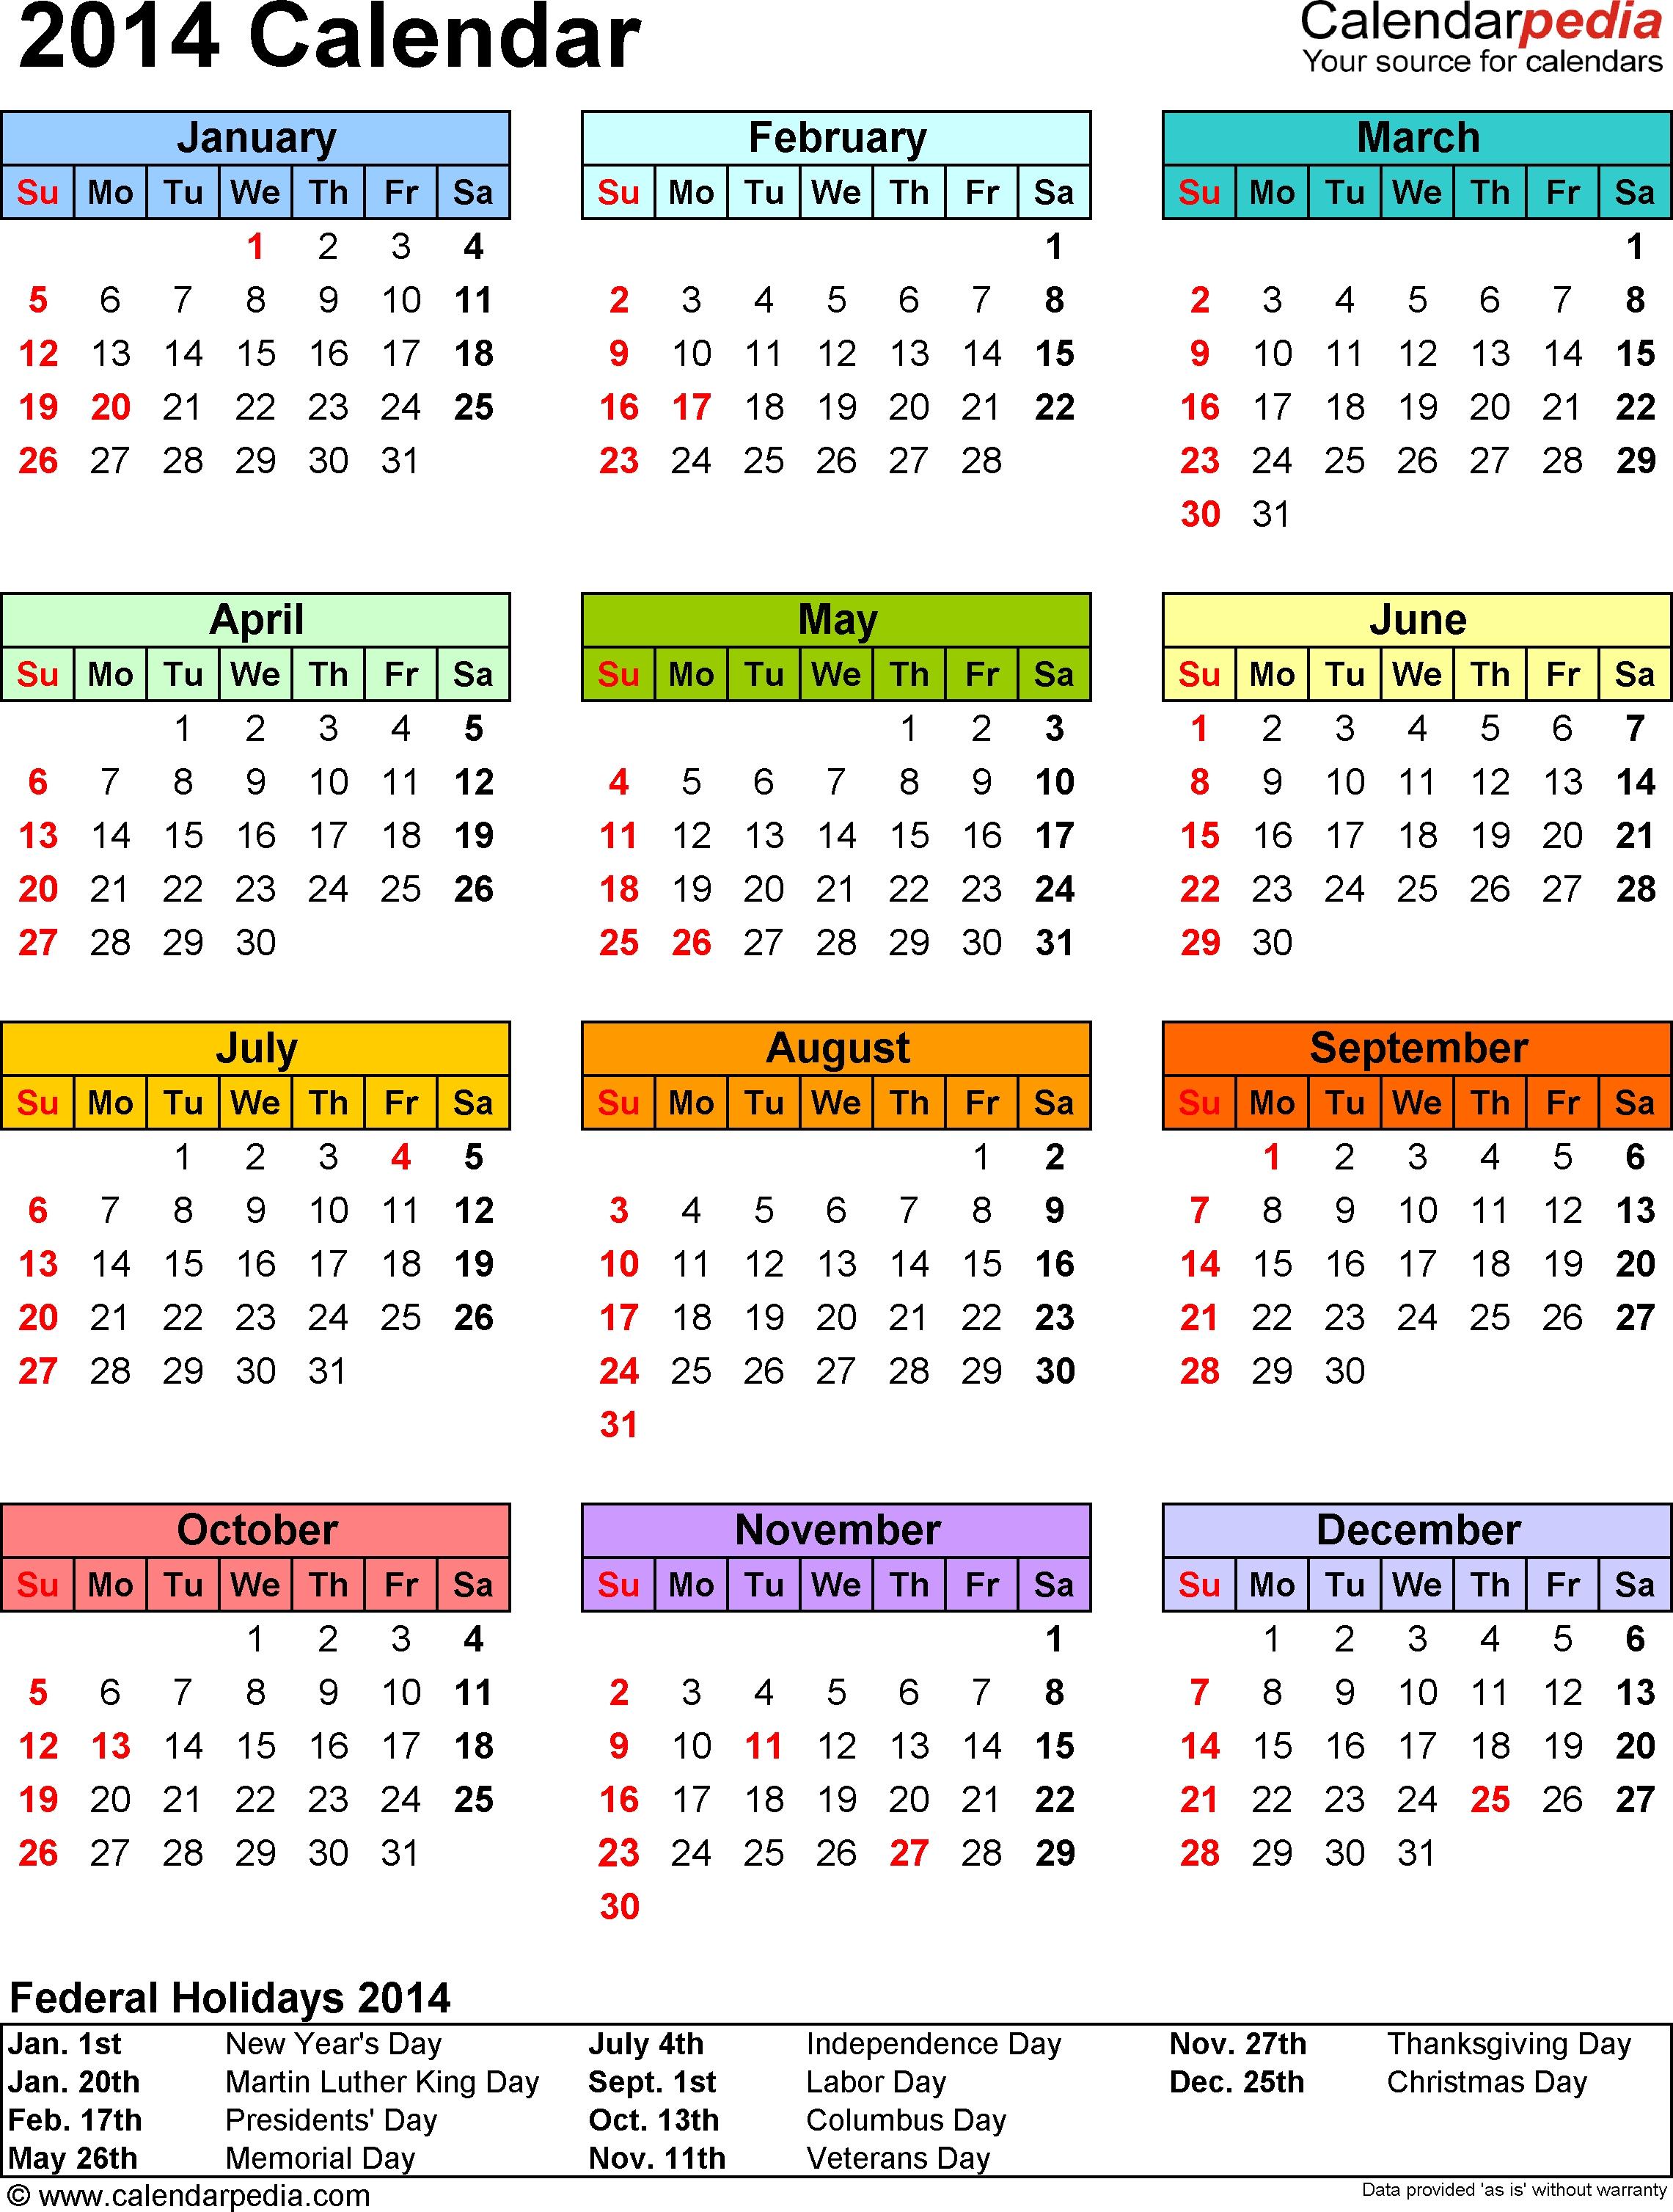 2014 Calendar - 13 Free Printable Word Calendar Templates  2014 12 Month Blank Calendar